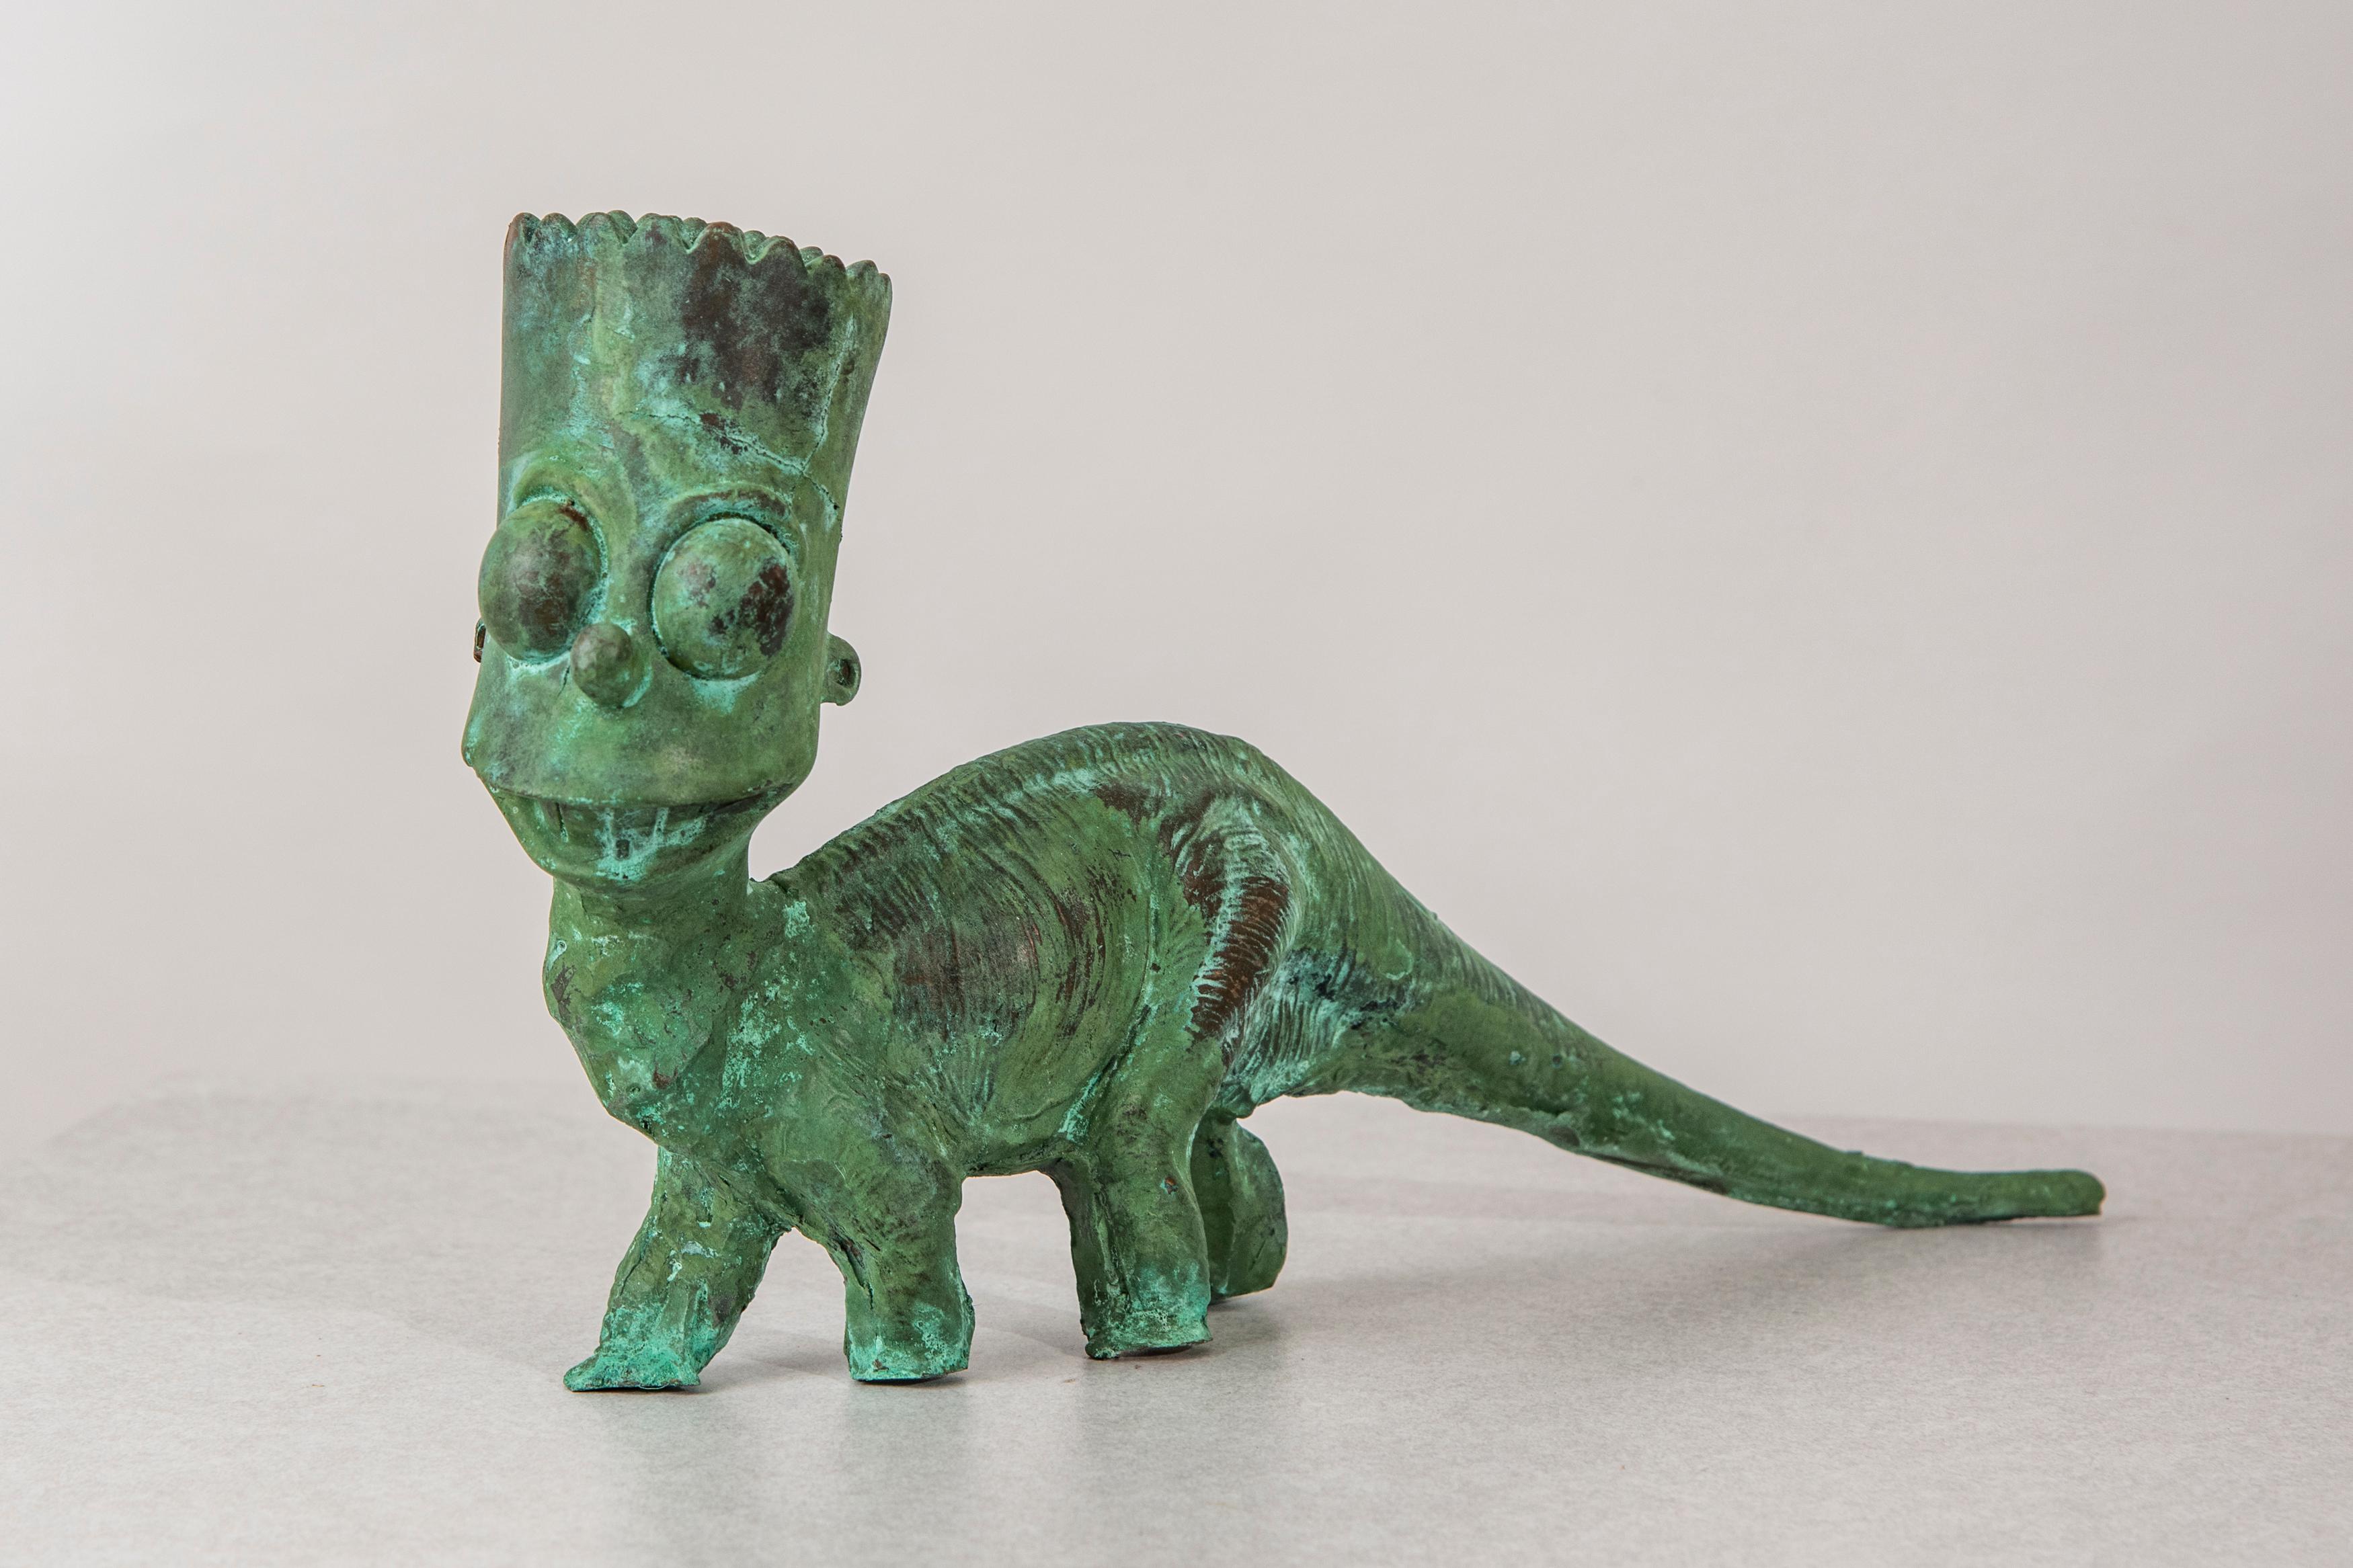 Bartosaurus II, 2019, by Joshua Goode, at Ivy Brown Gallery